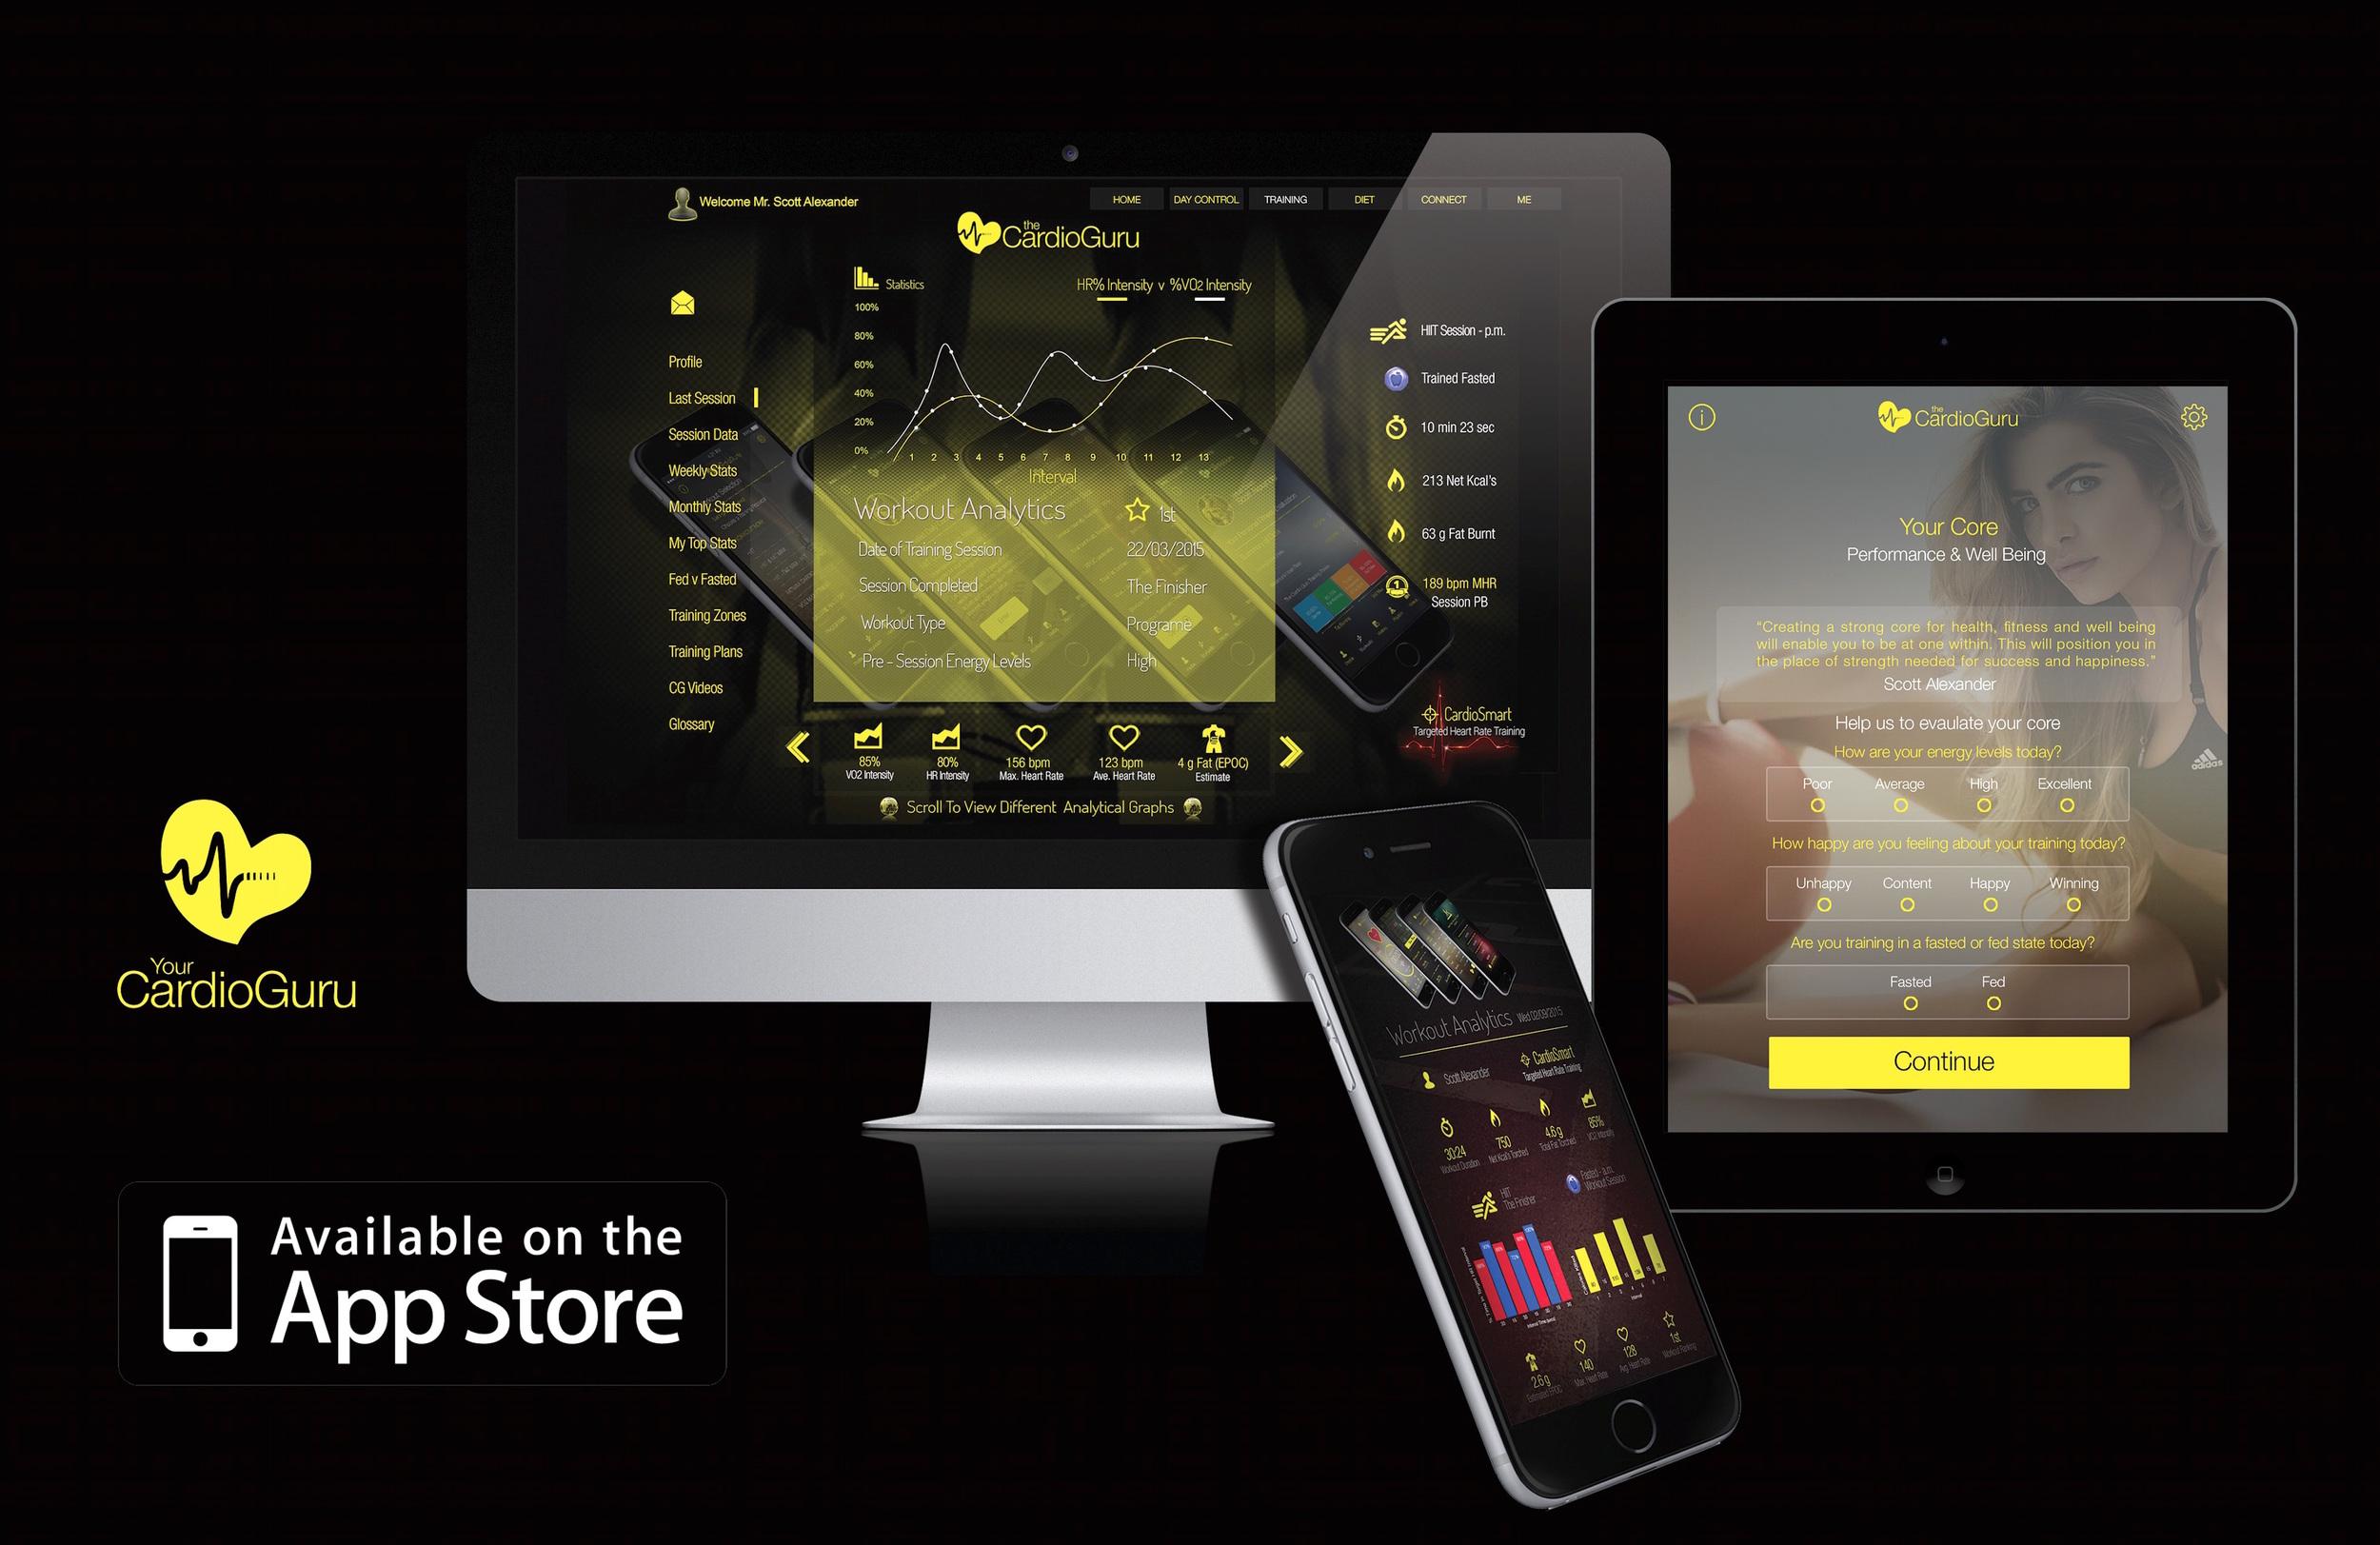 Both Your CardioGuru & Your CardioGuru Pro available on :iOS 8 or later, iPhone 5 or later, iPad Air, iPad Mini, iPad Pro